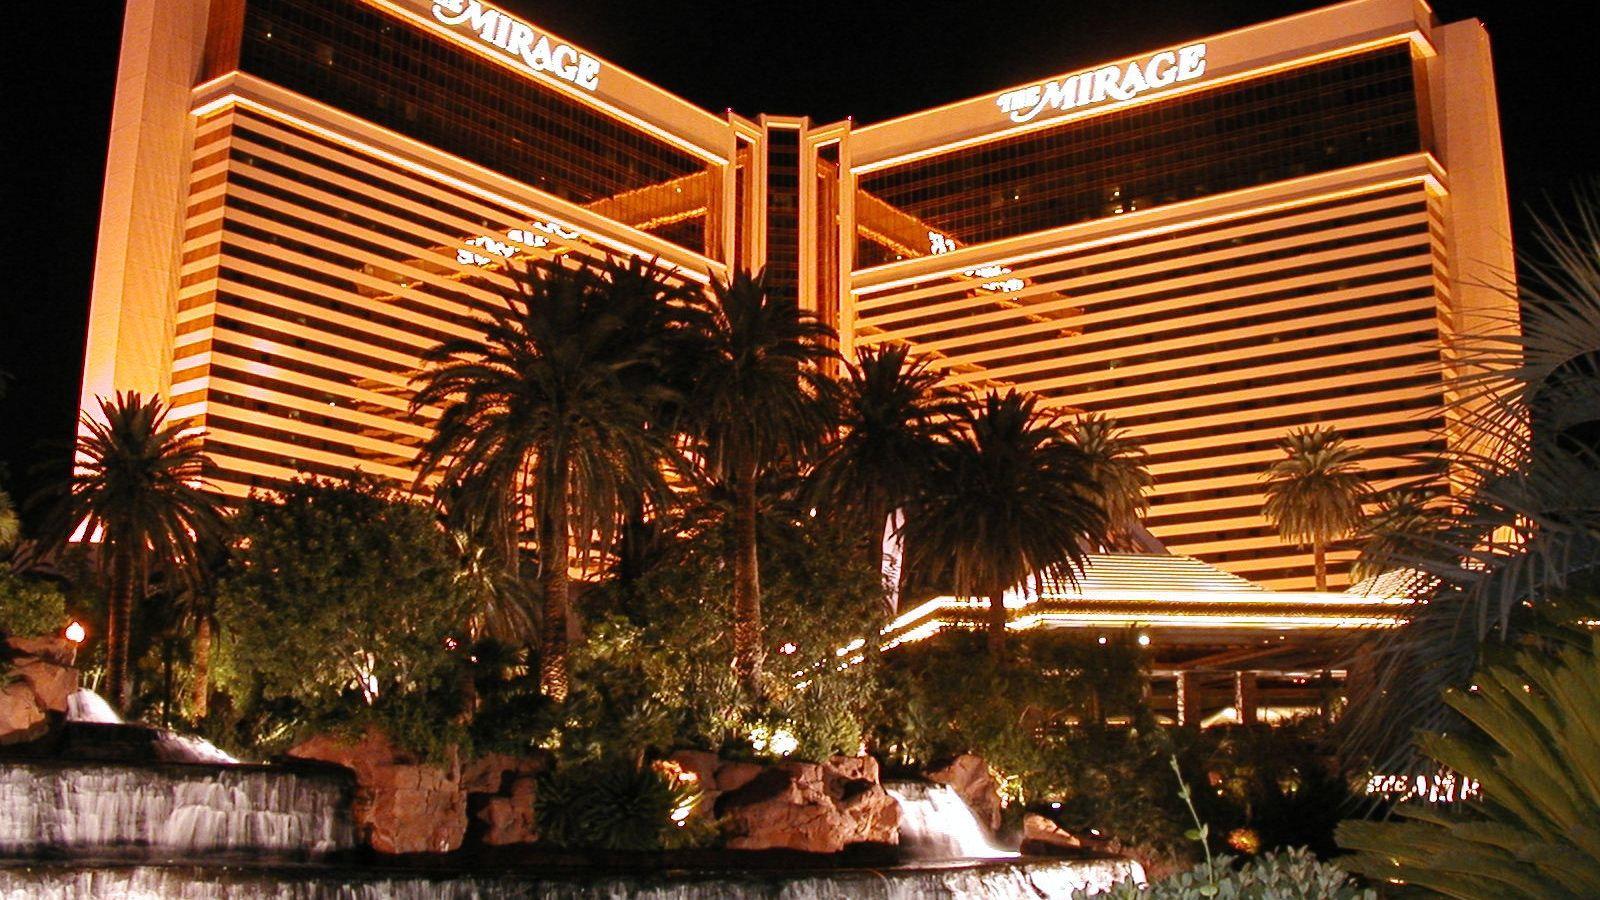 Mirage - Las Vegas golf packages